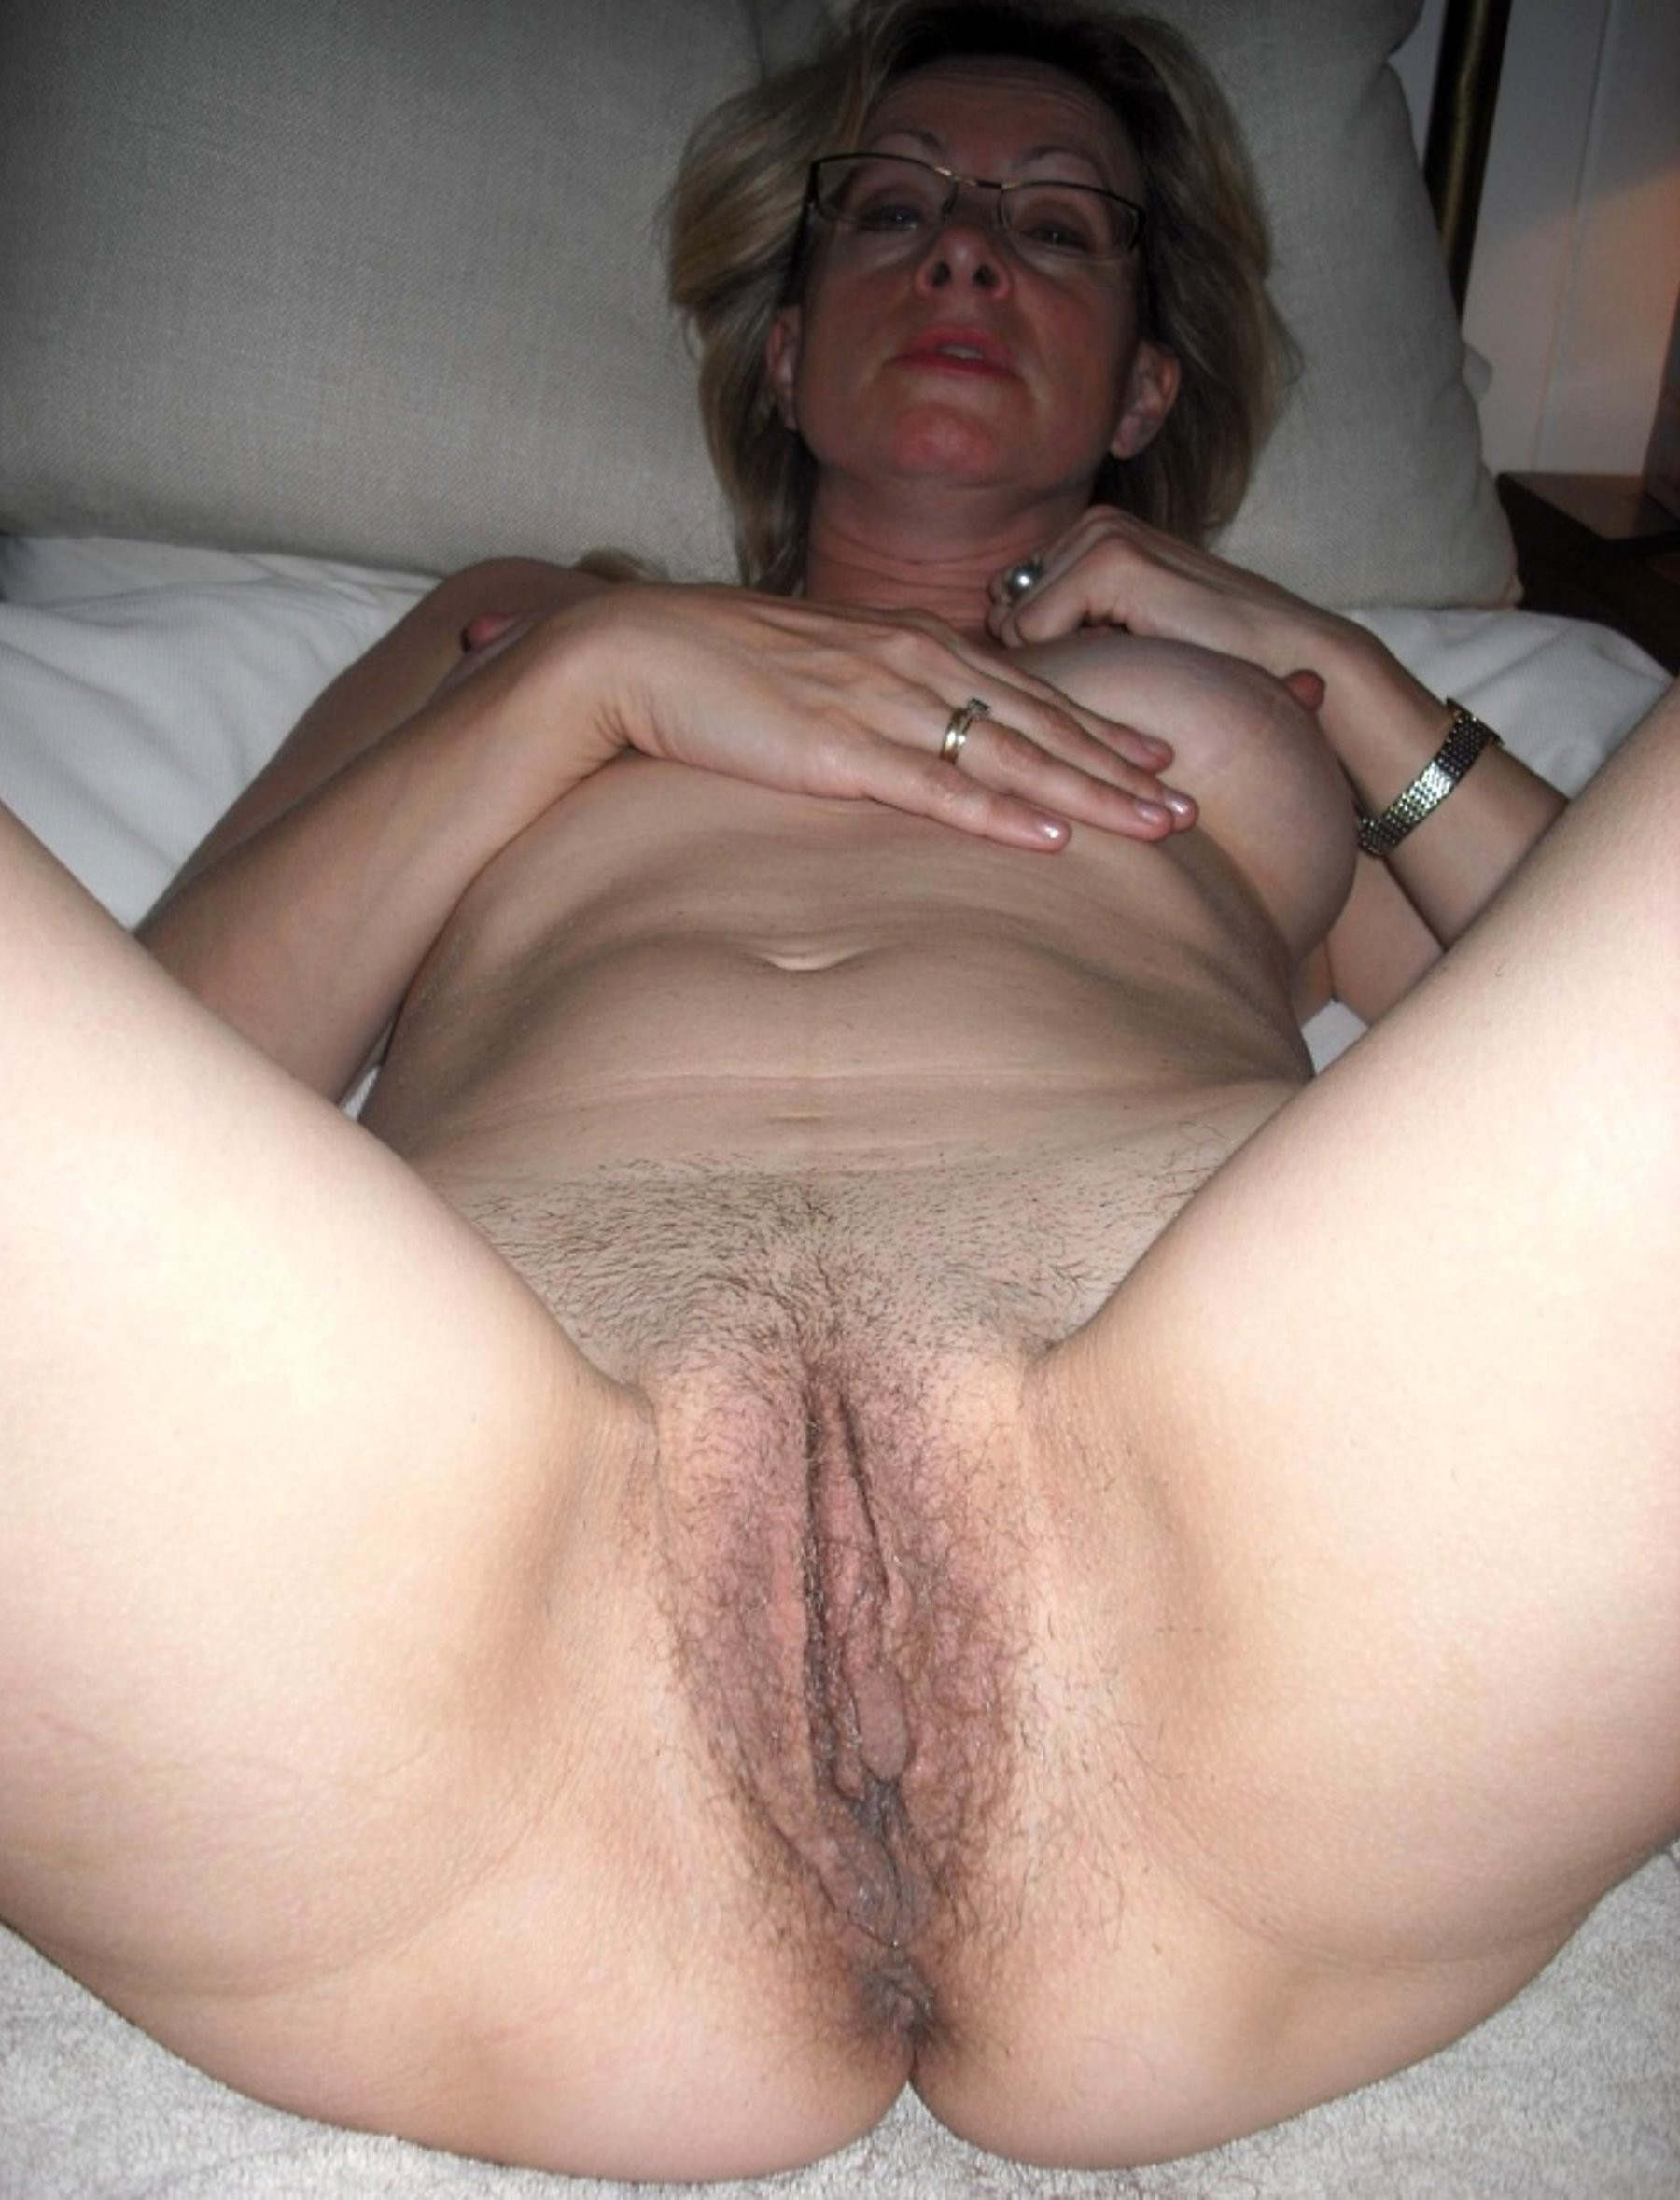 Vagina pretty Woman With